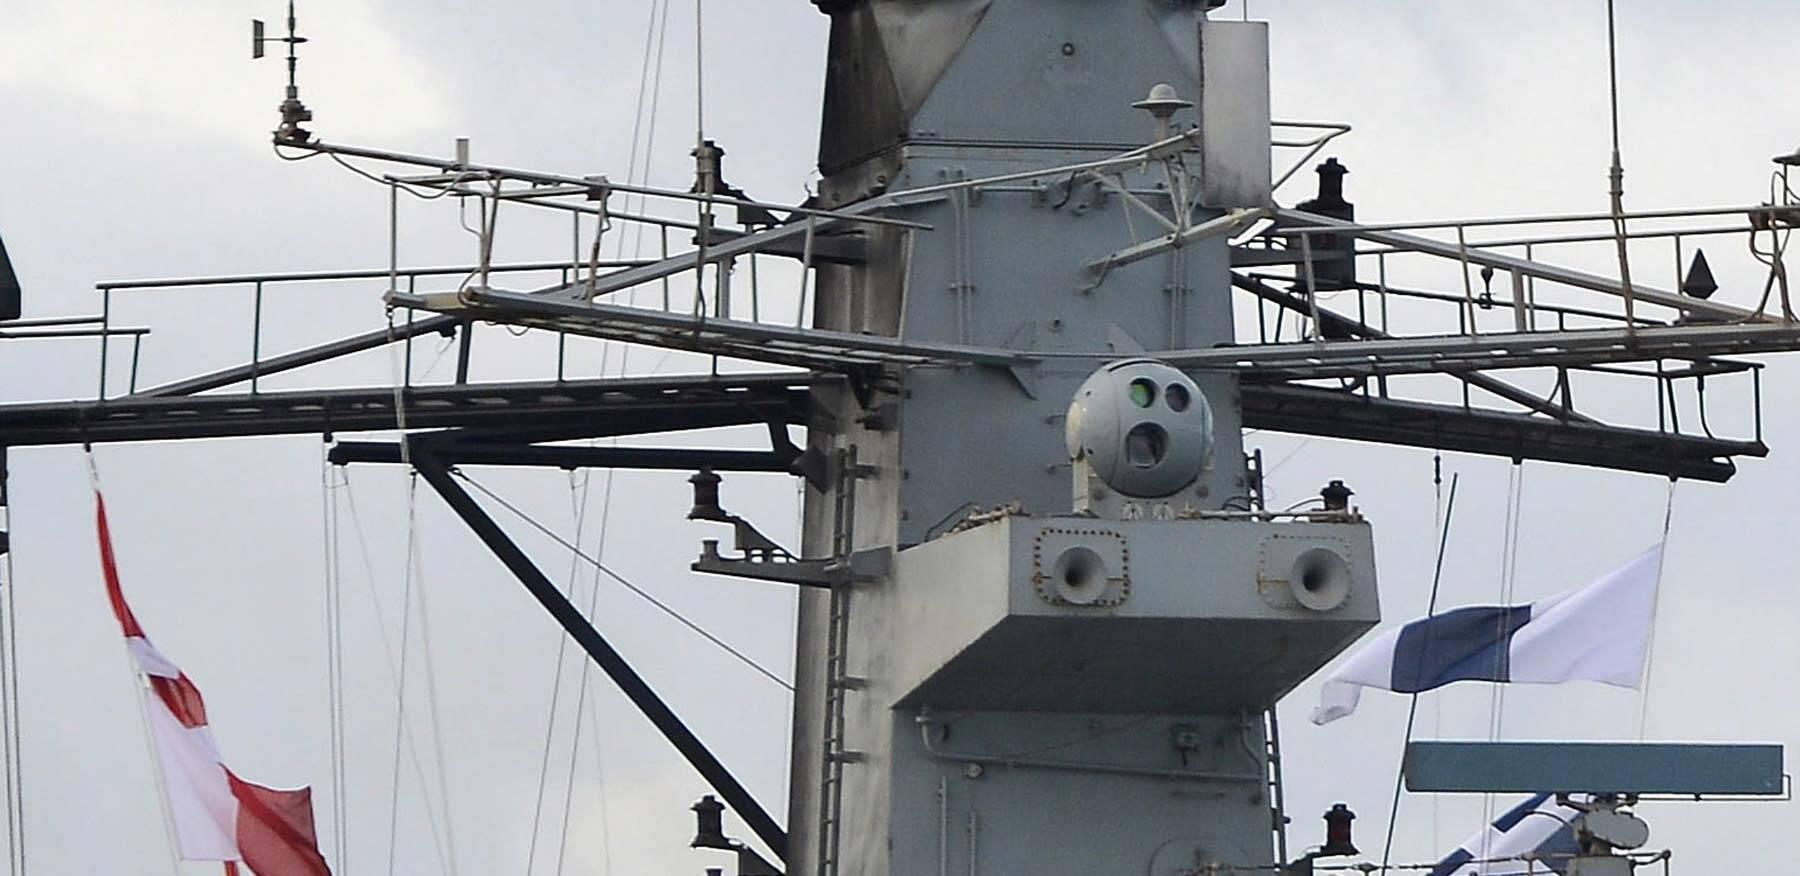 Sea Archer Type 23 Frigate